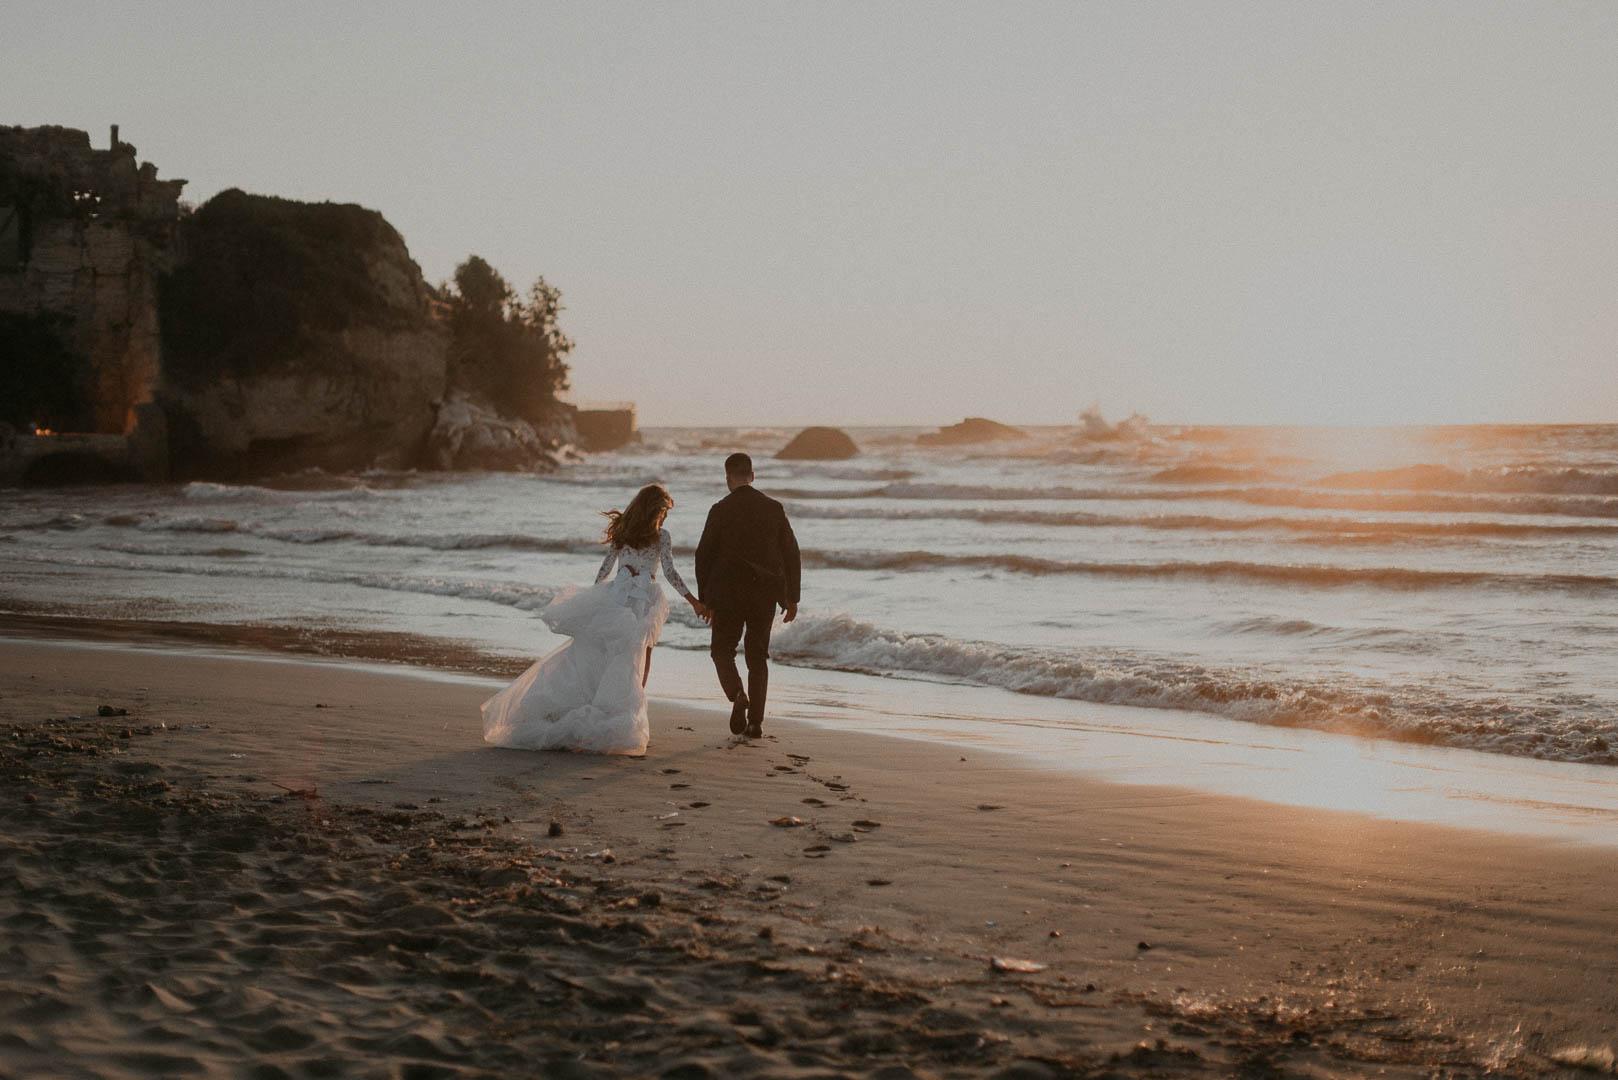 wedding-photographer-destination-fineart-bespoke-reportage-napoli-nabilah-vivianeizzo-spazio46-112